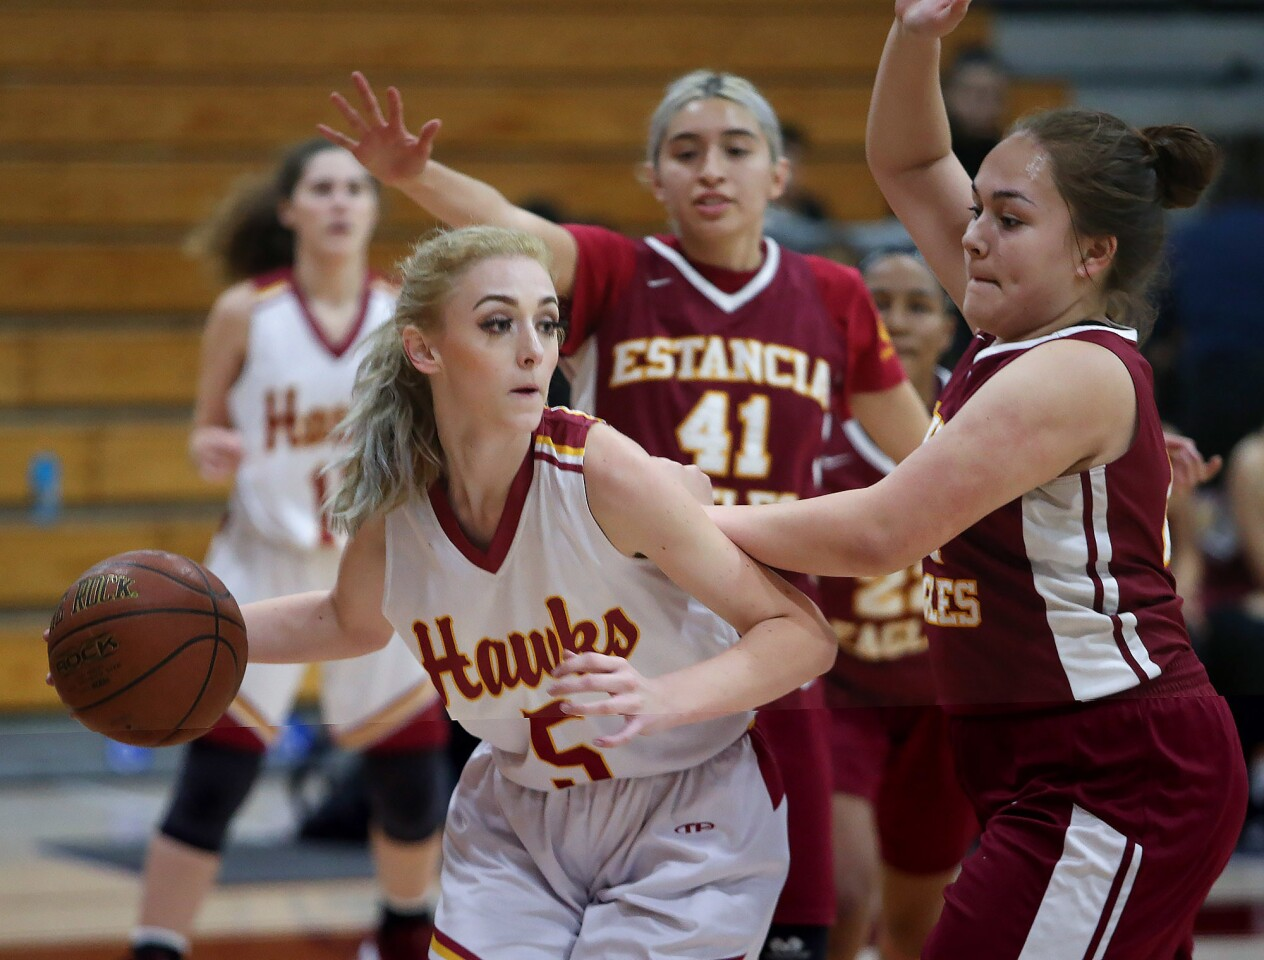 Estancia Christmas Basketball Tournament 2021 Photo Gallery Estancia Vs Ocean View In Girls Basketball Los Angeles Times